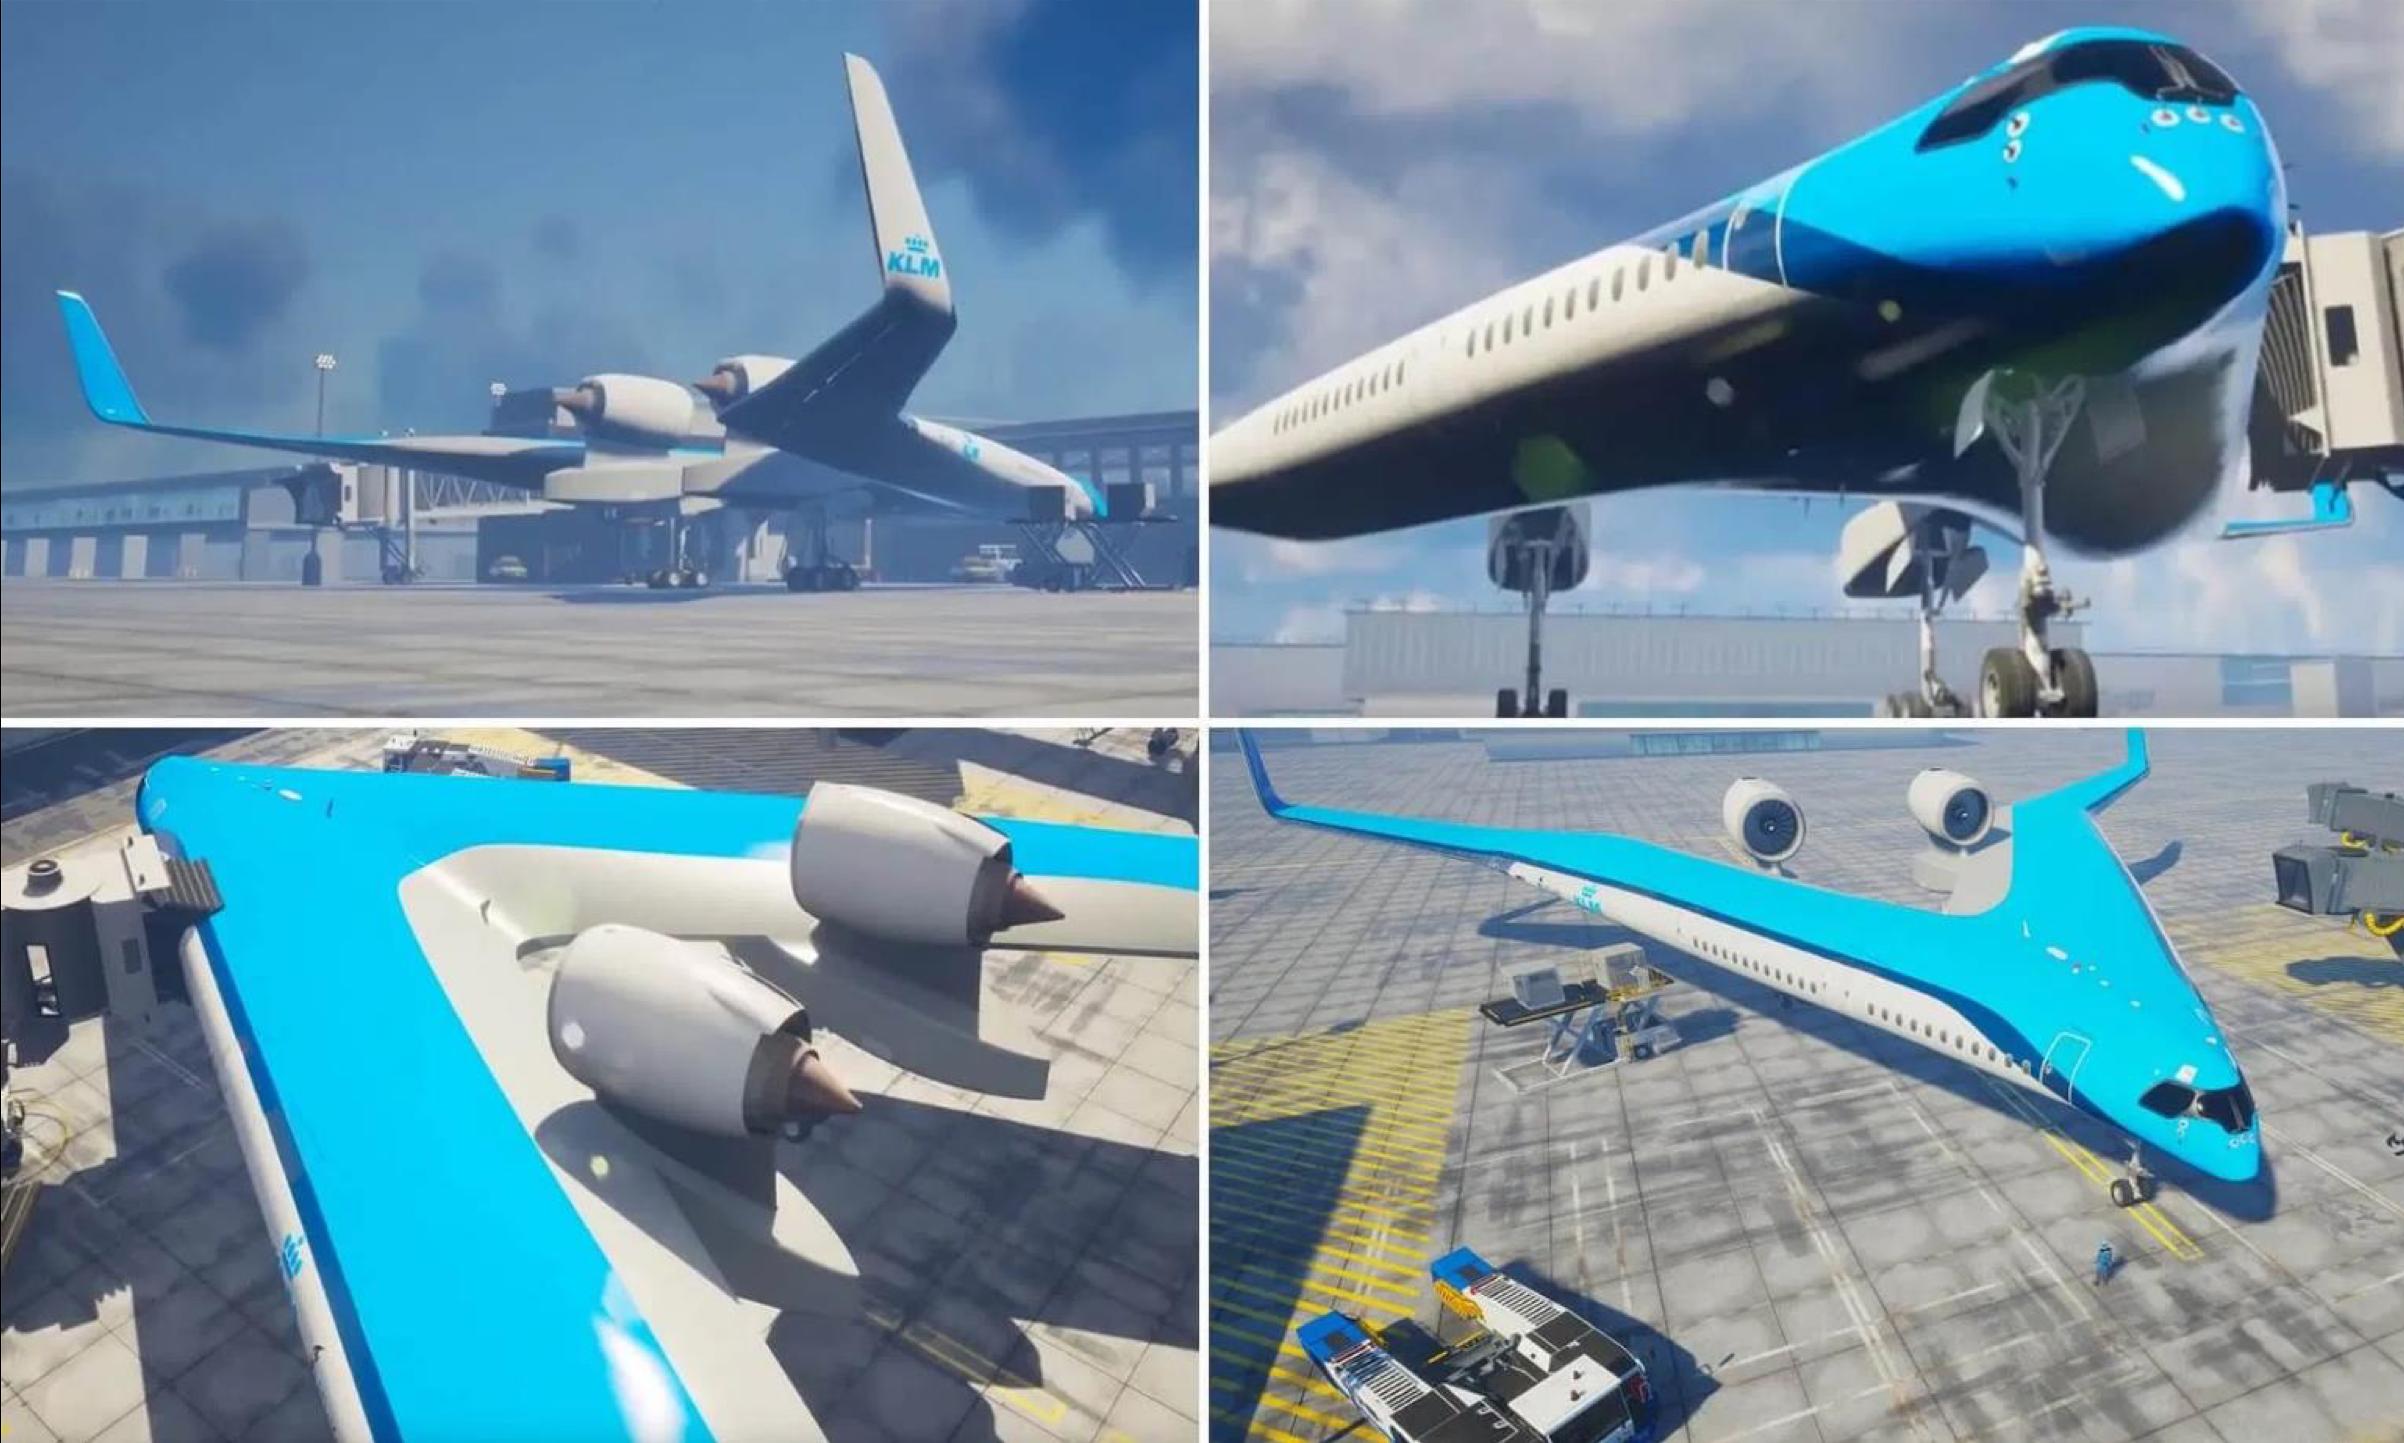 V plane KLM